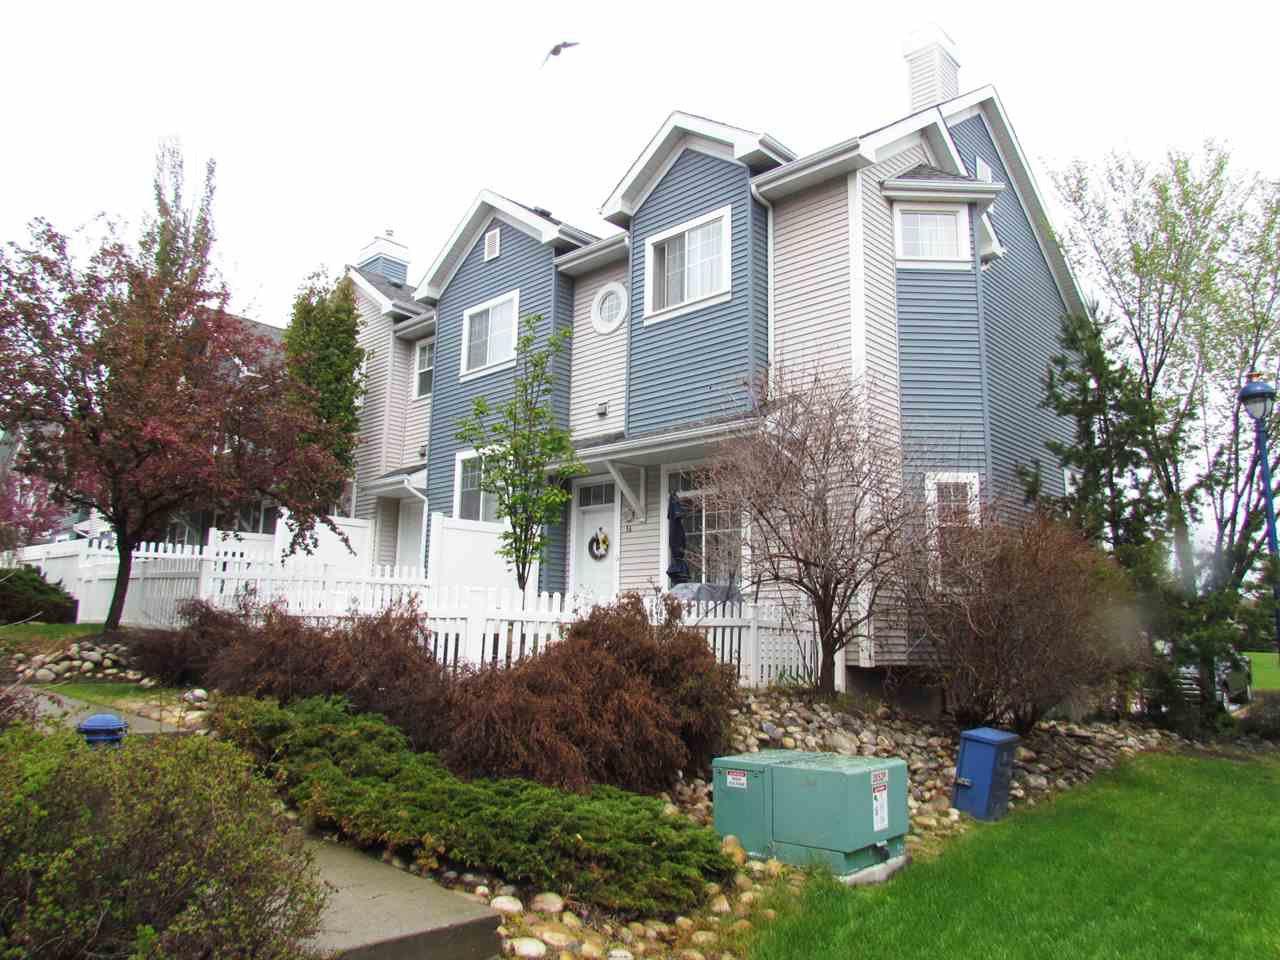 Main Photo: 56 8304 11 Avenue in Edmonton: Zone 53 Townhouse for sale : MLS®# E4198098